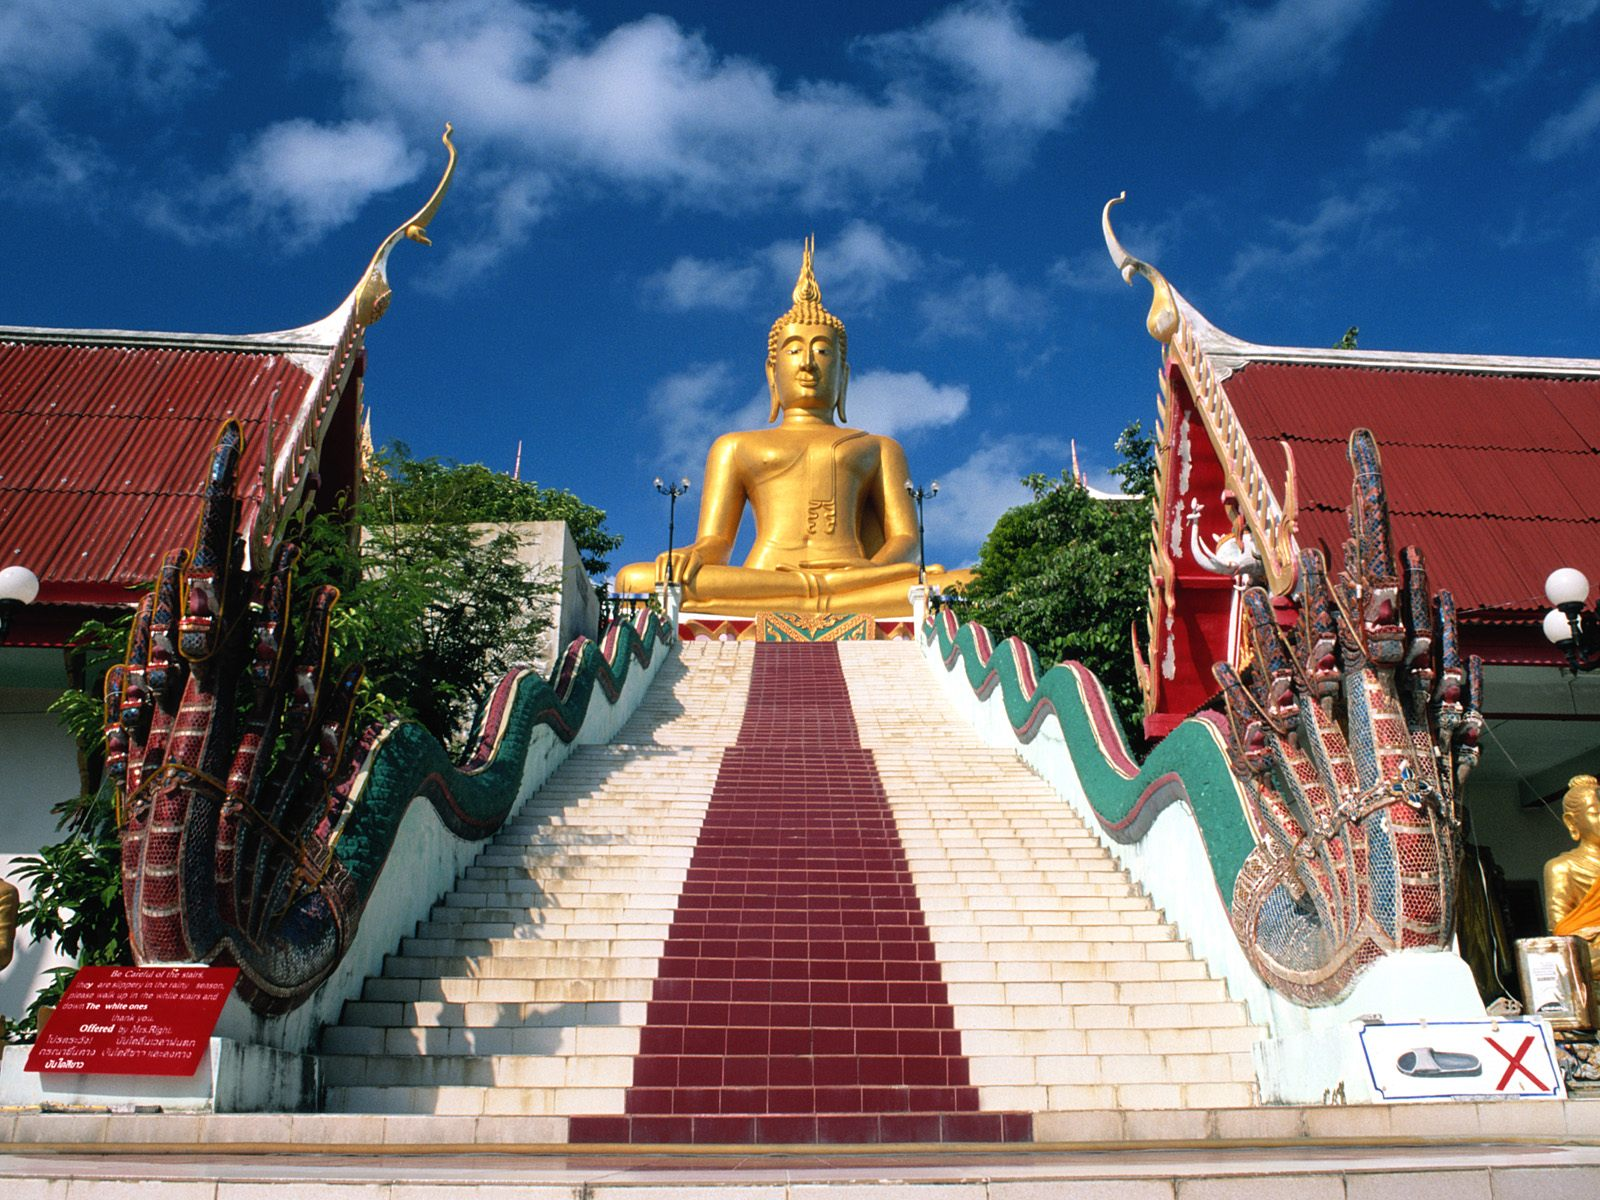 Koh Samui, The Golden Buddha